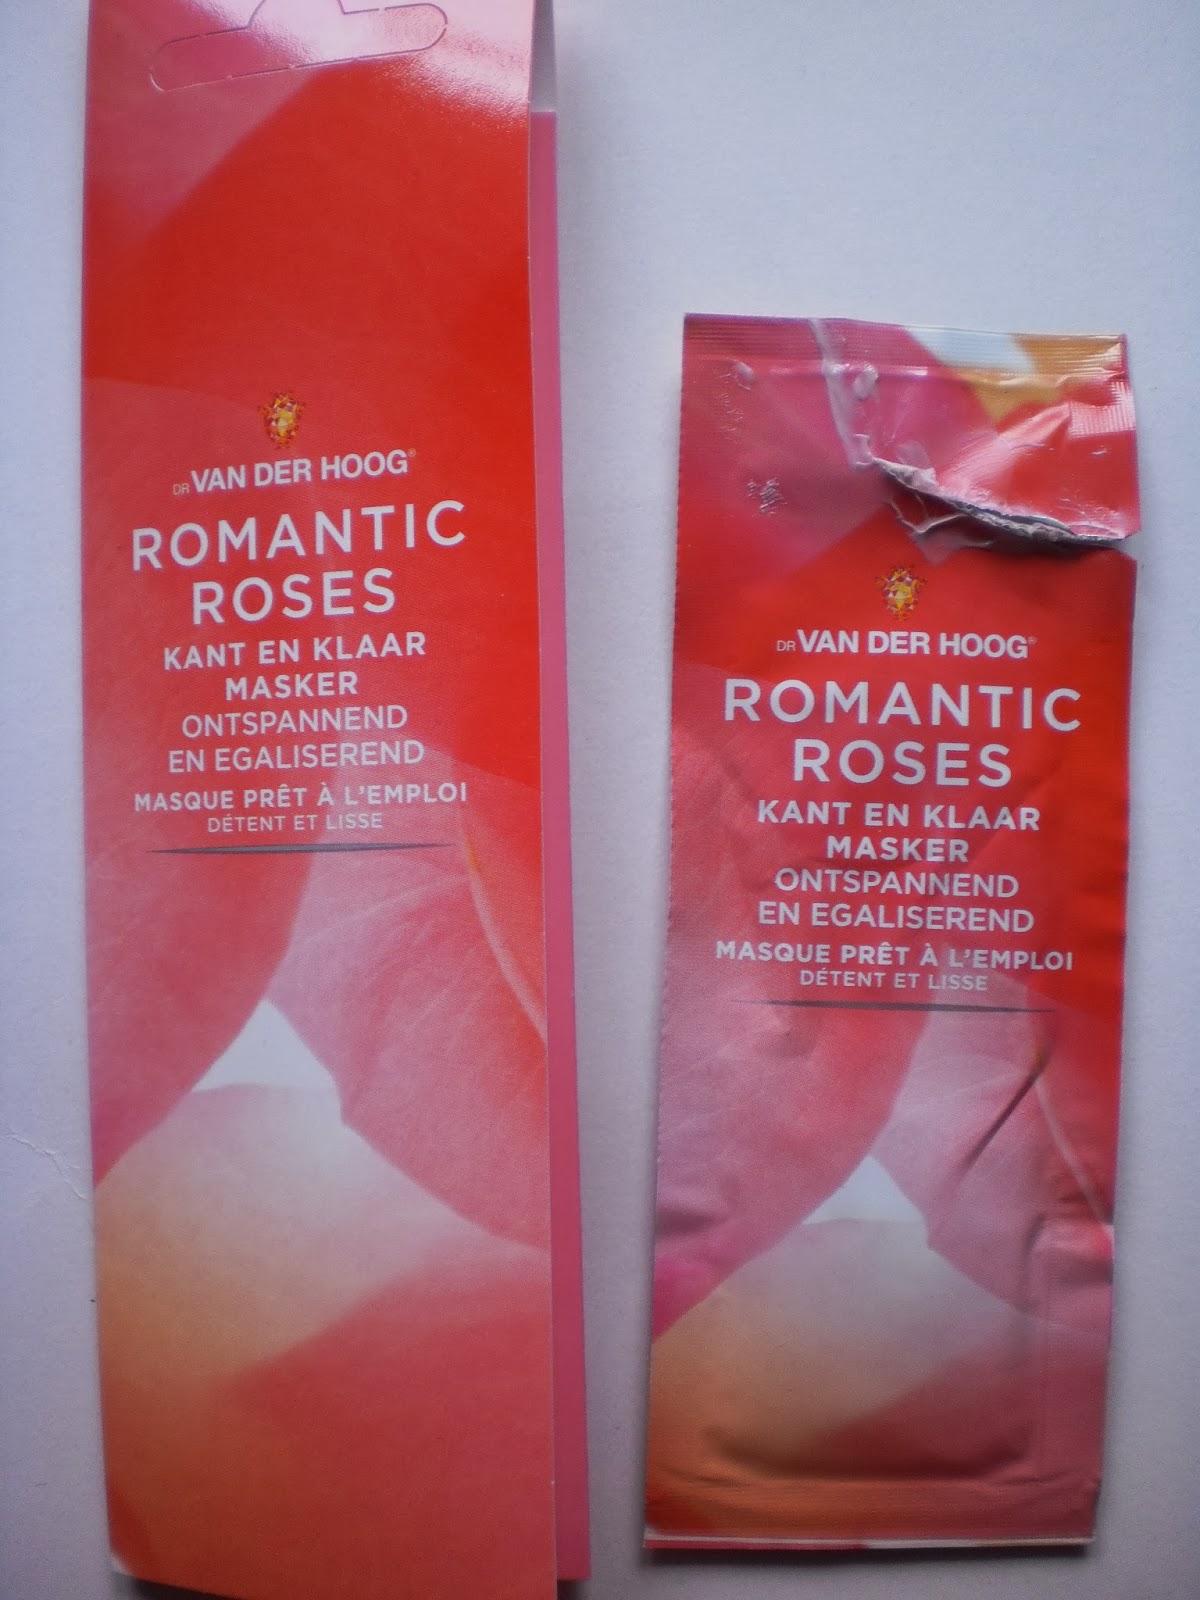 Dr Van Der Hoog Romantic Roses kant en klaar masker